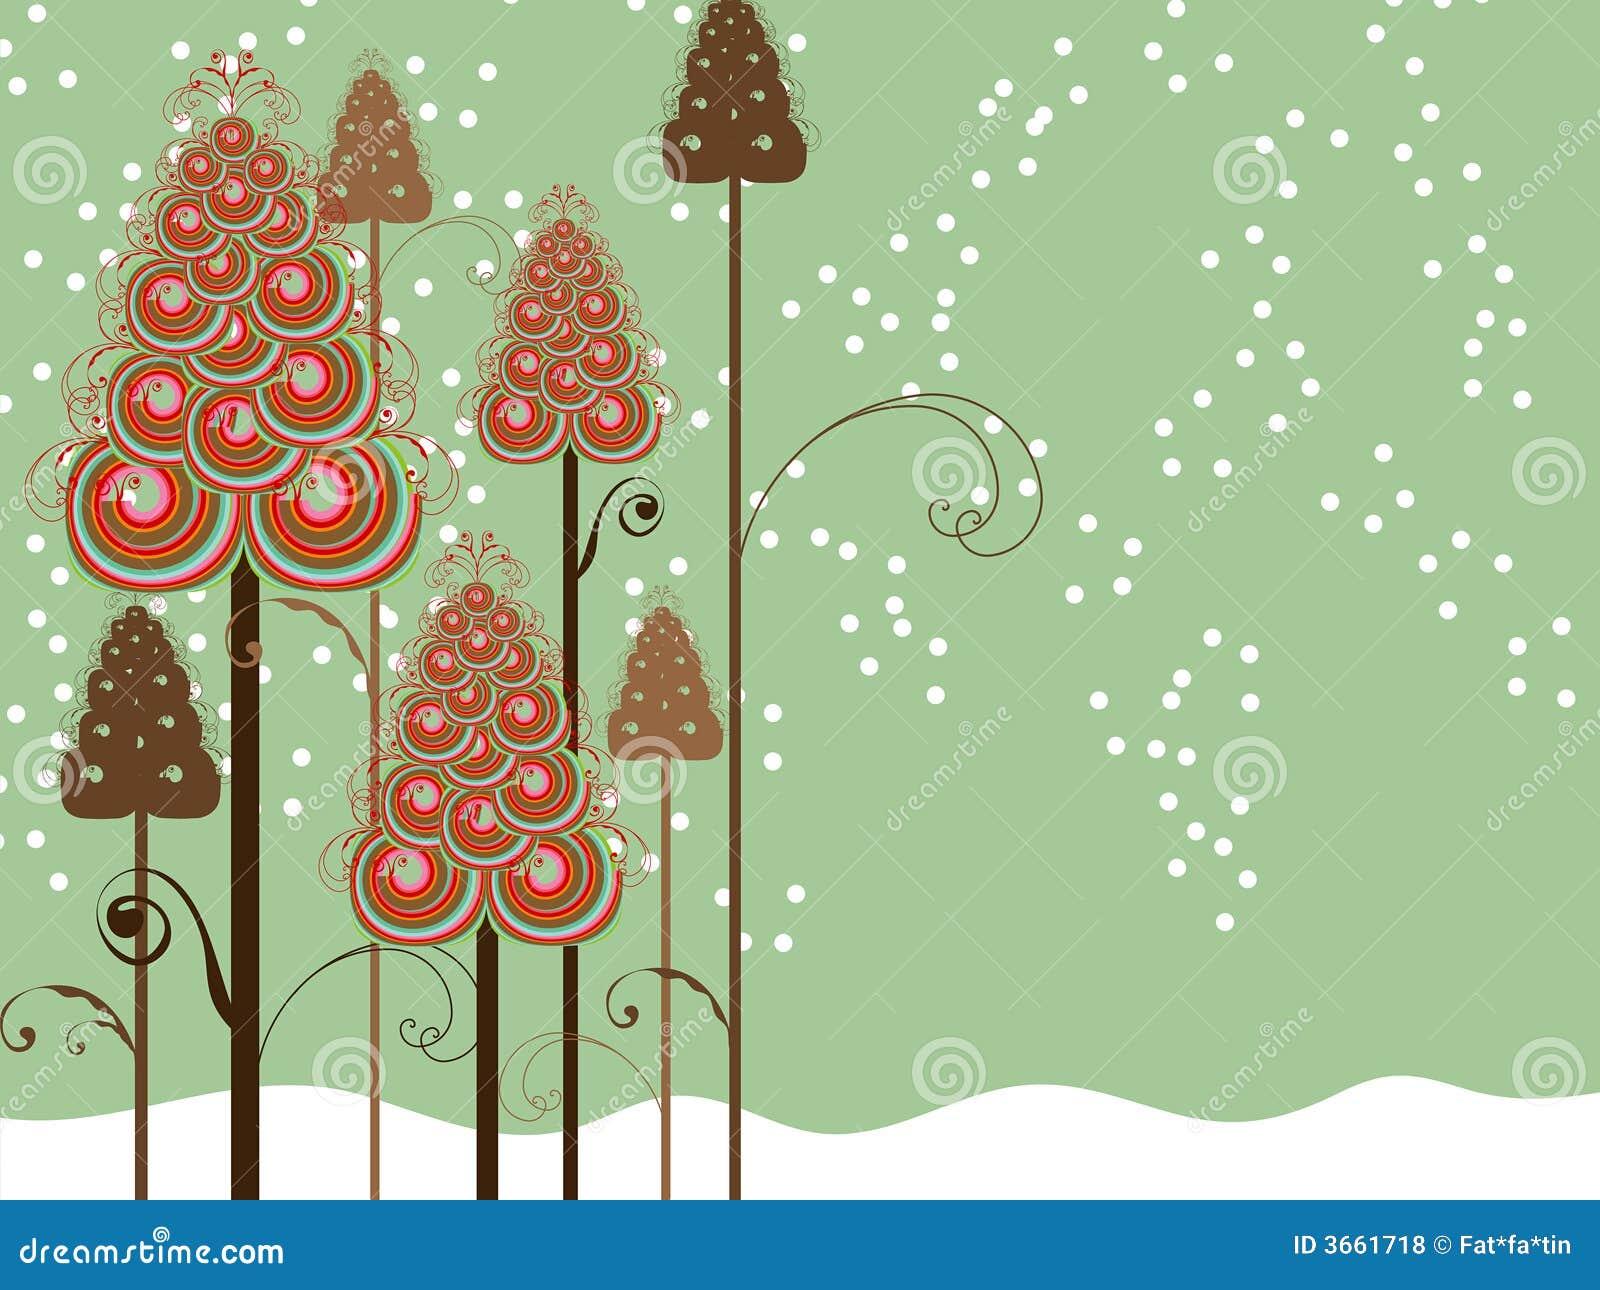 Whimsical swirls winter trees